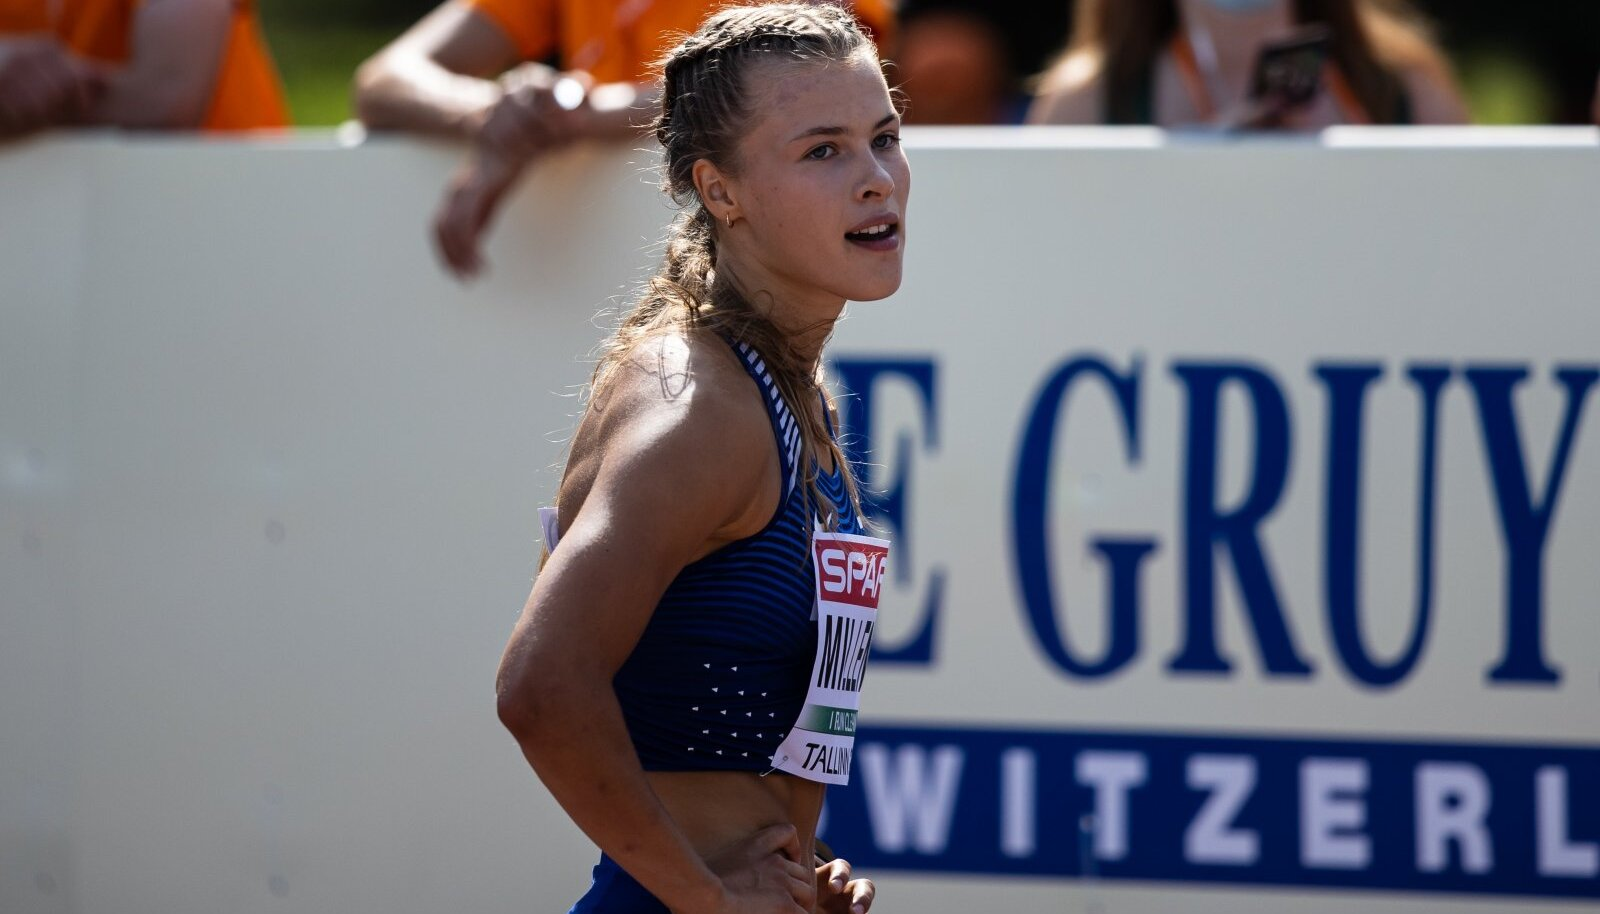 Anna Maria Millend.